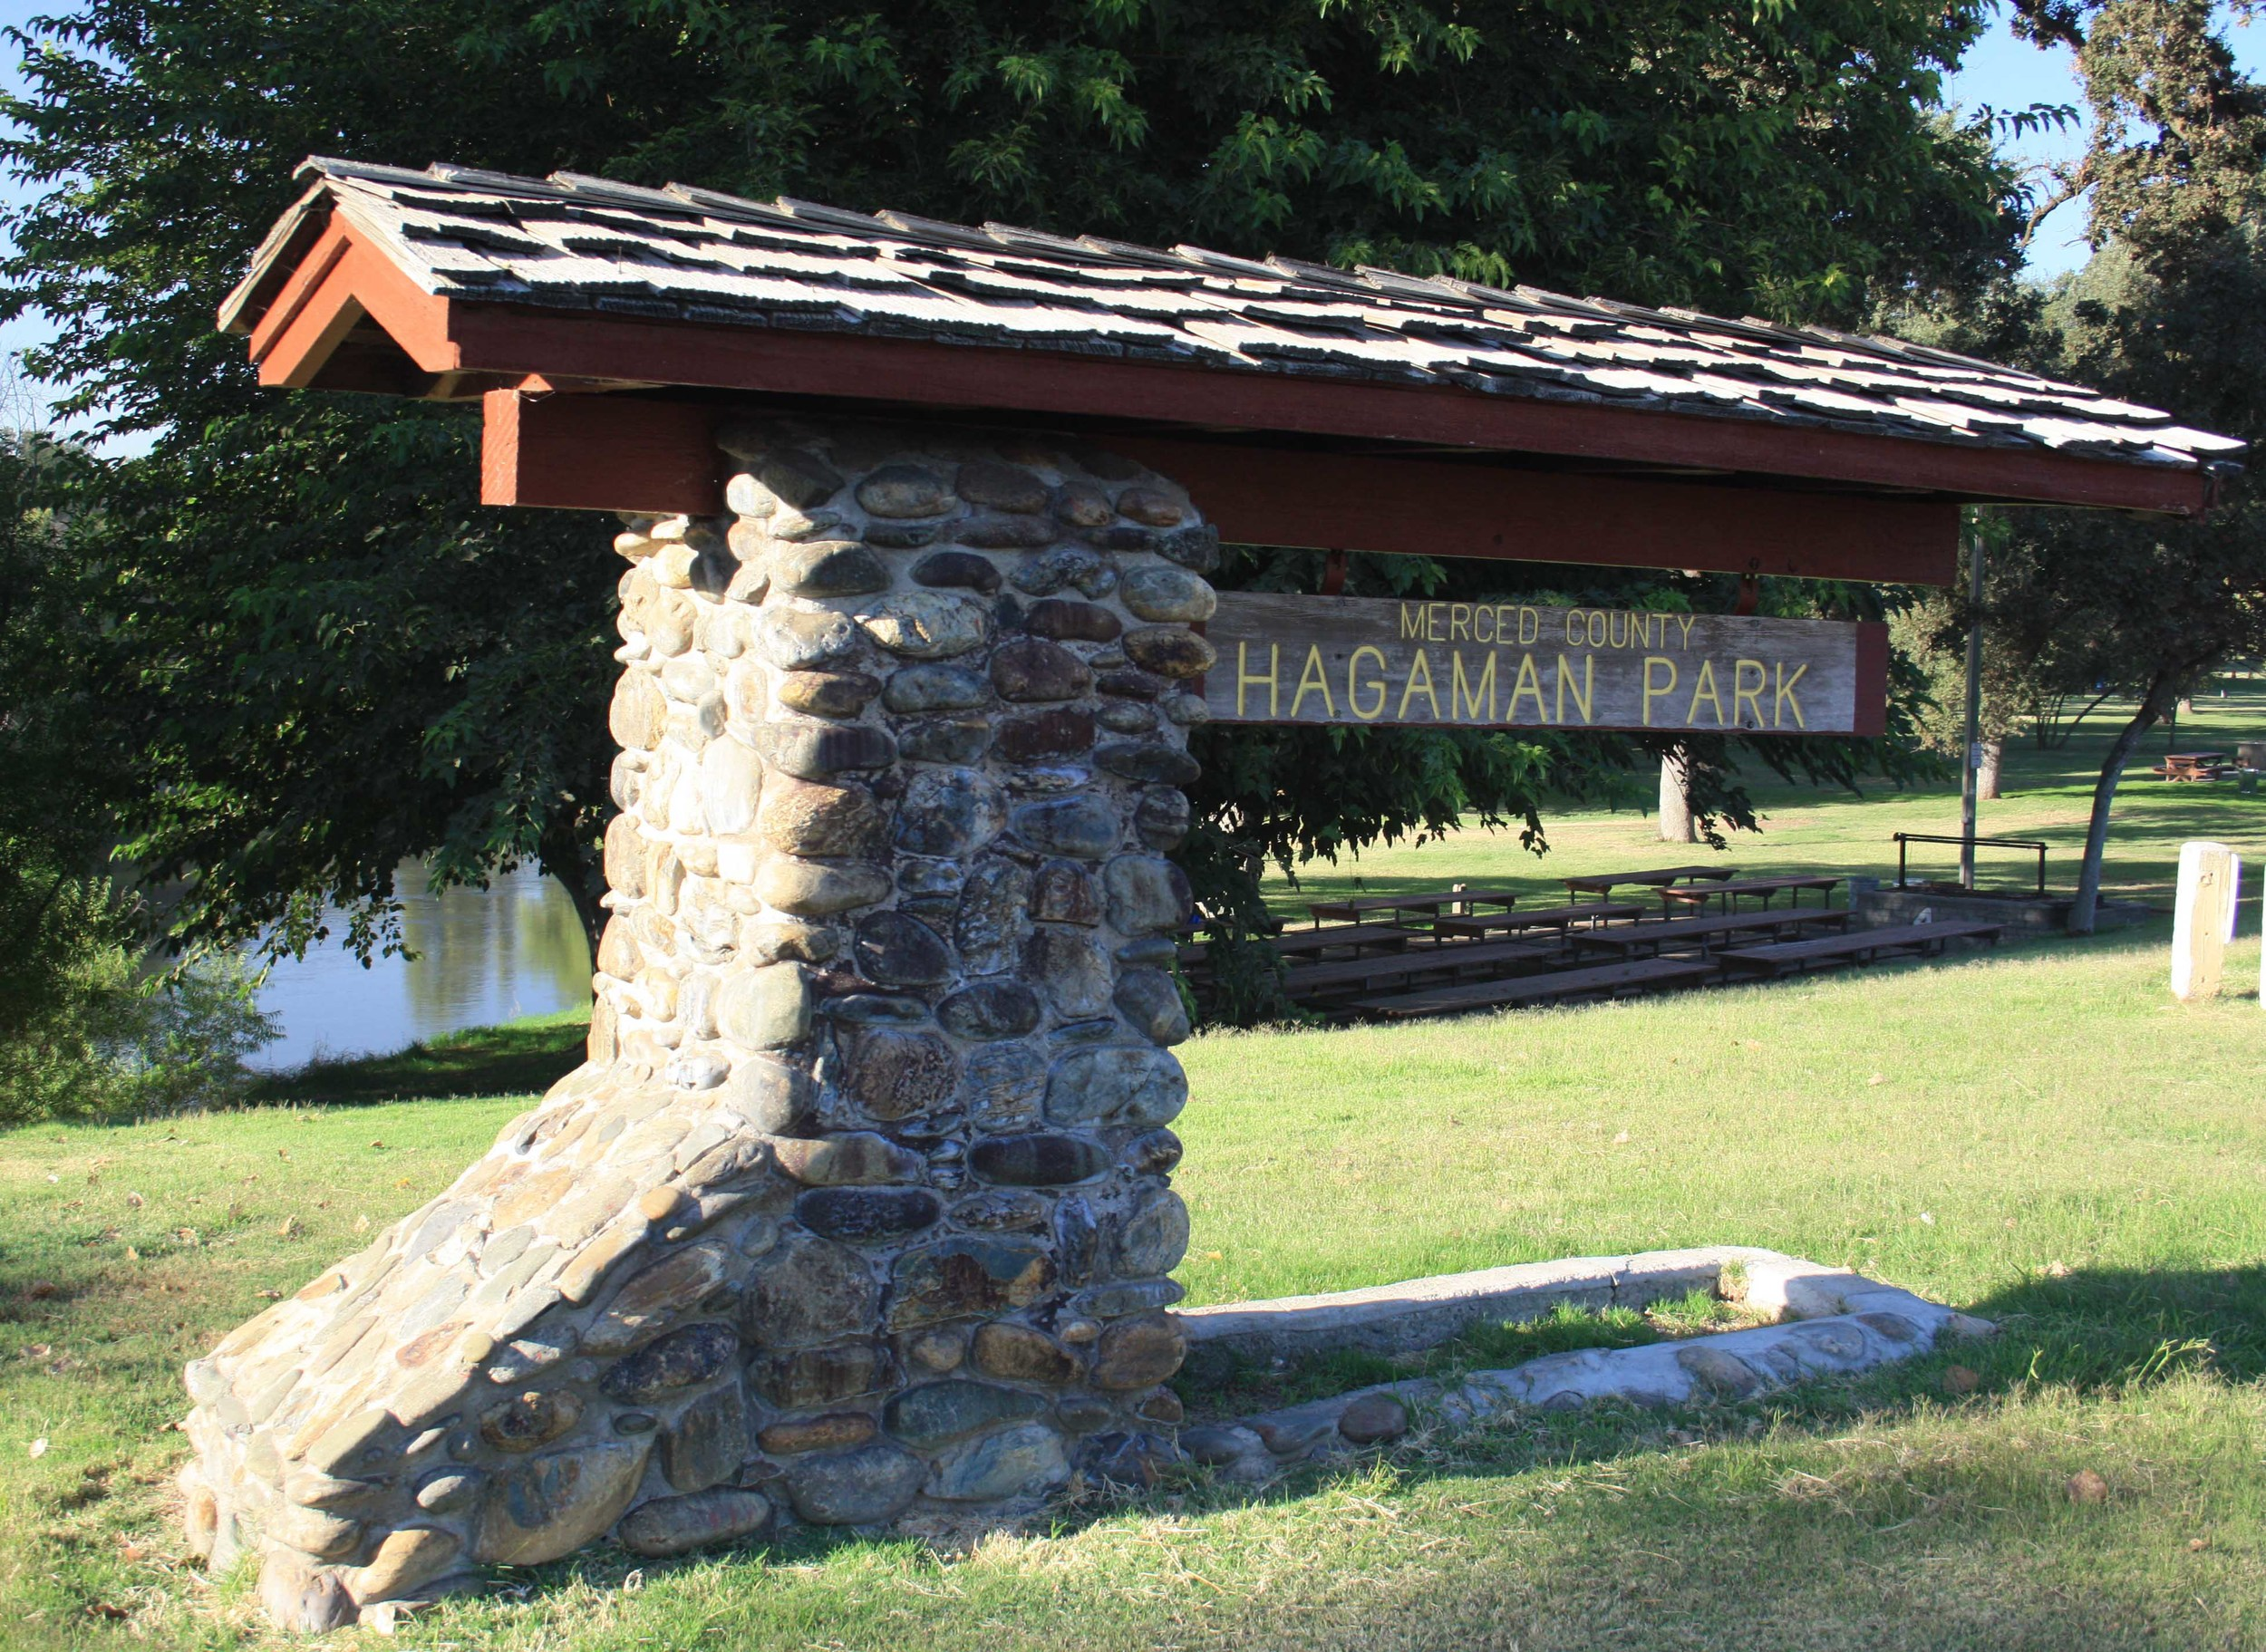 Hagaman Park